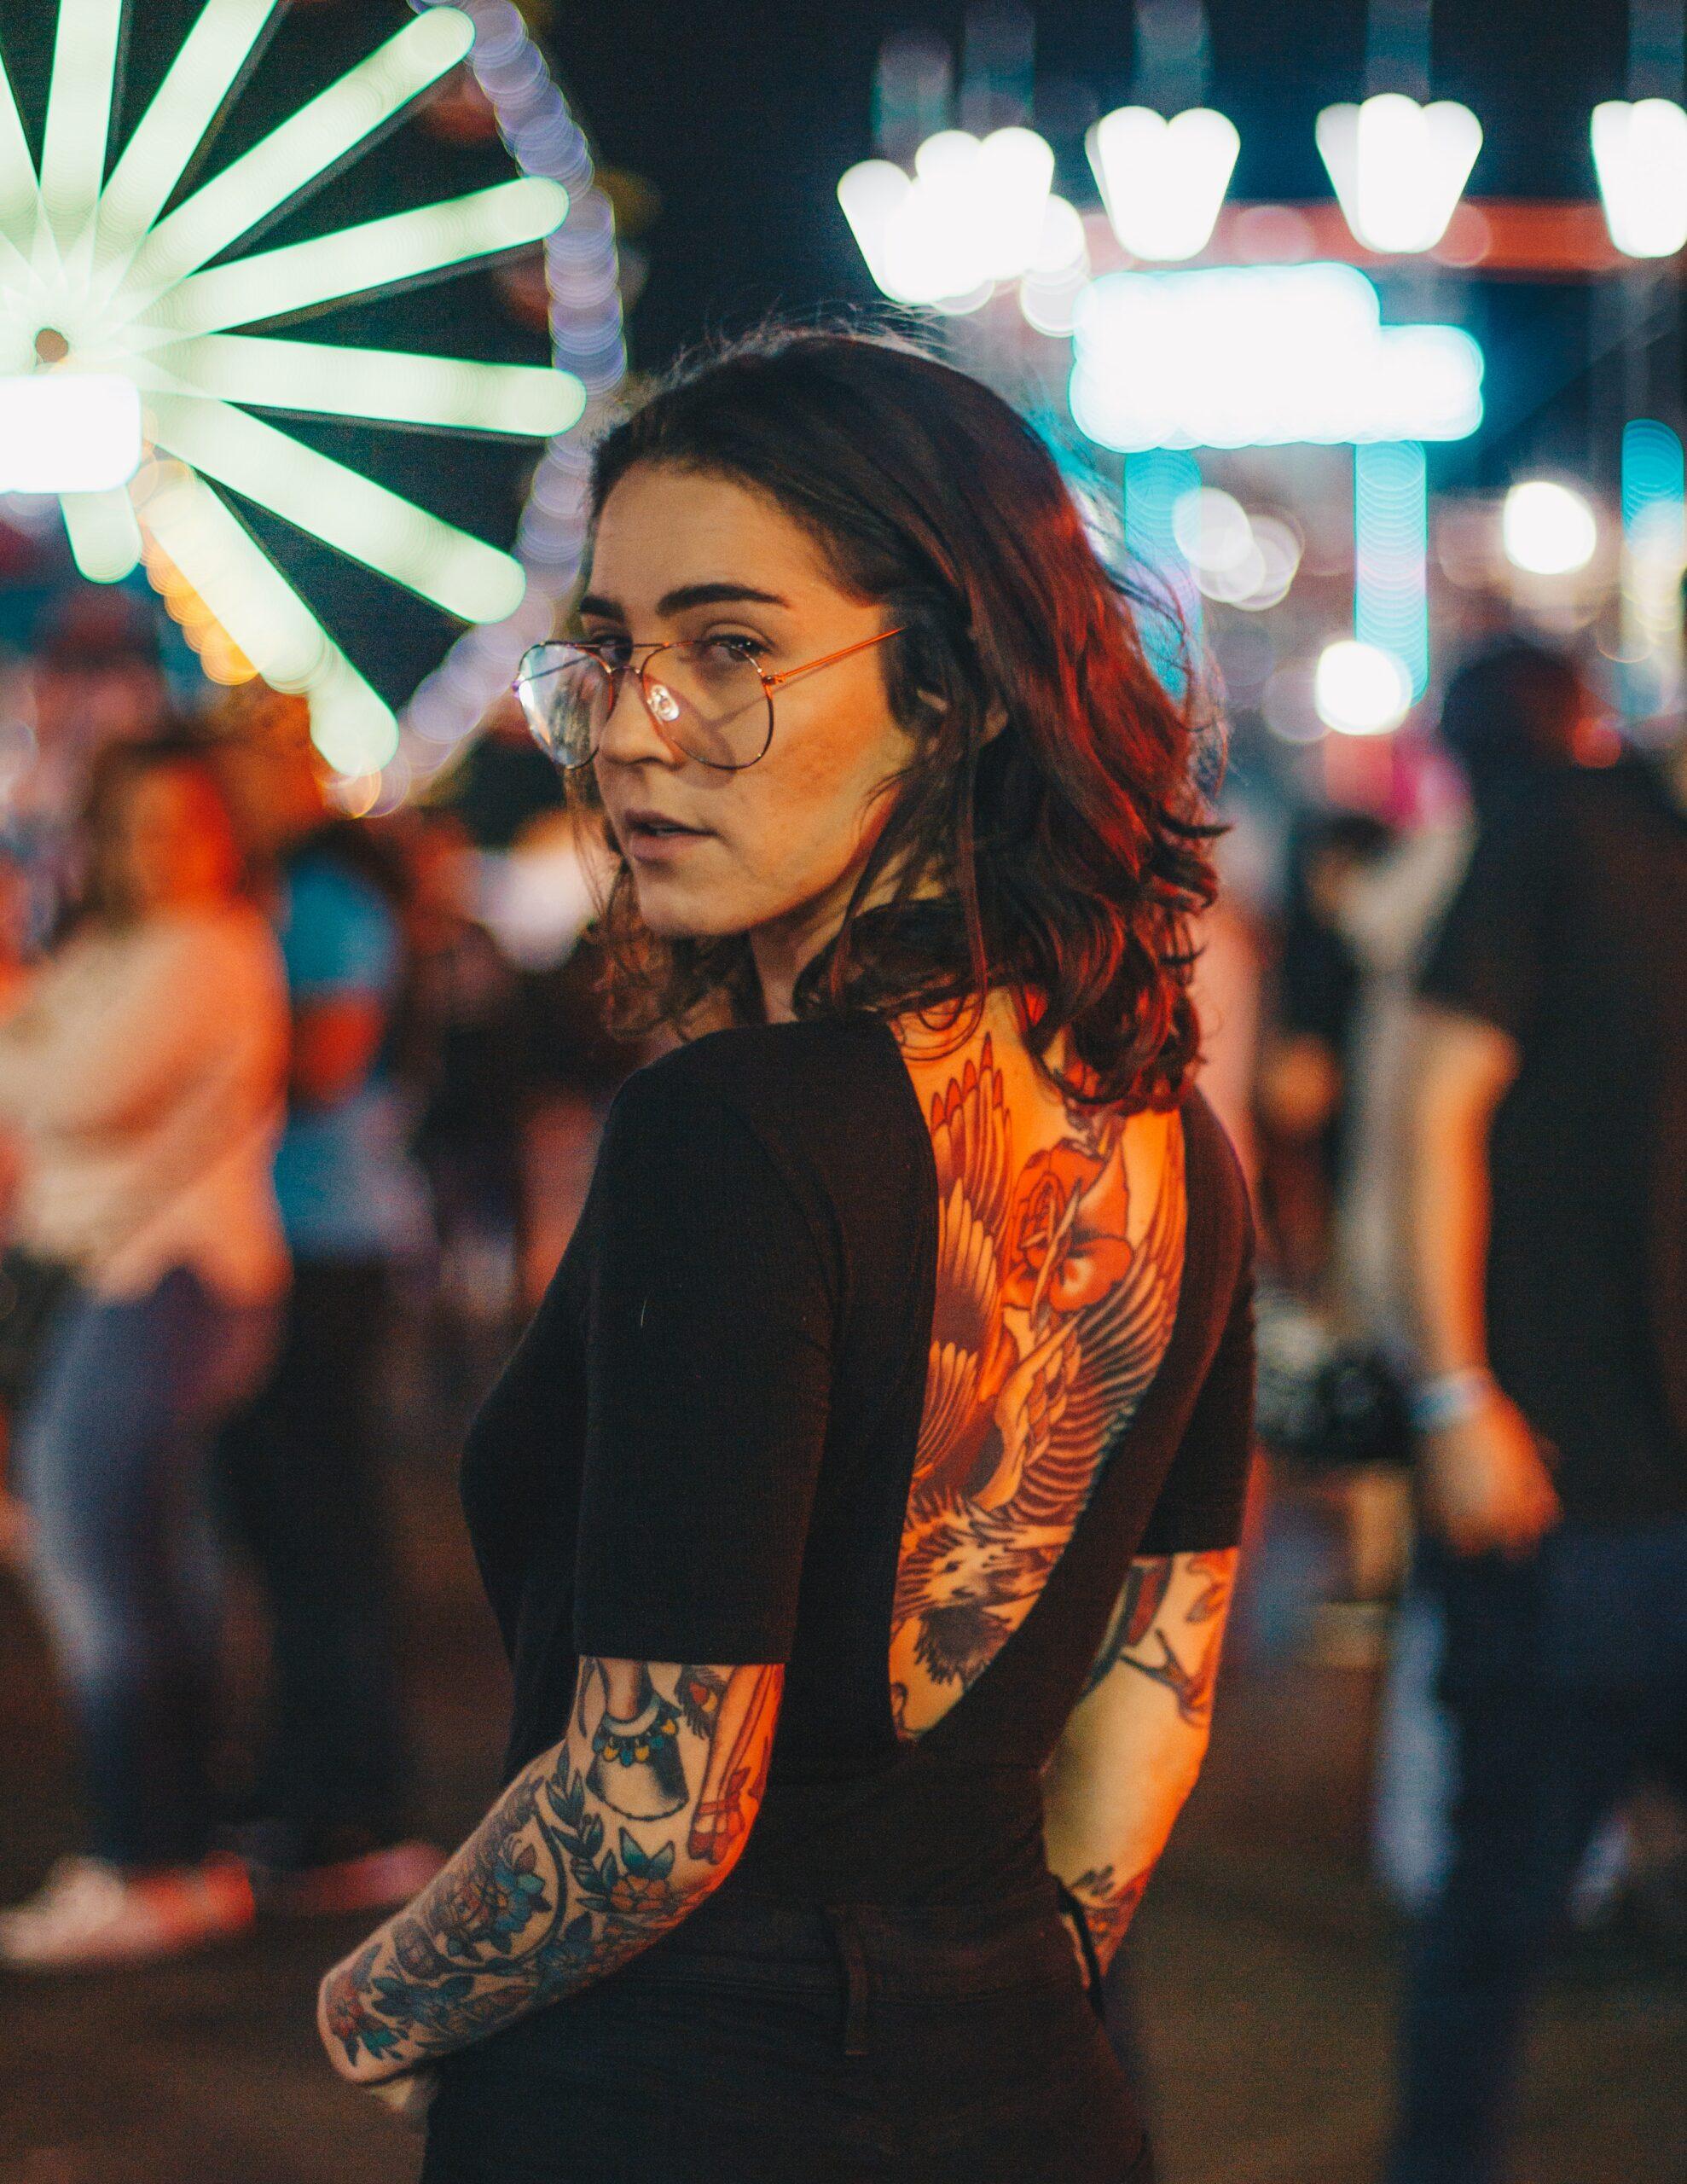 portrait photography of woman standing near Ferris Wheel